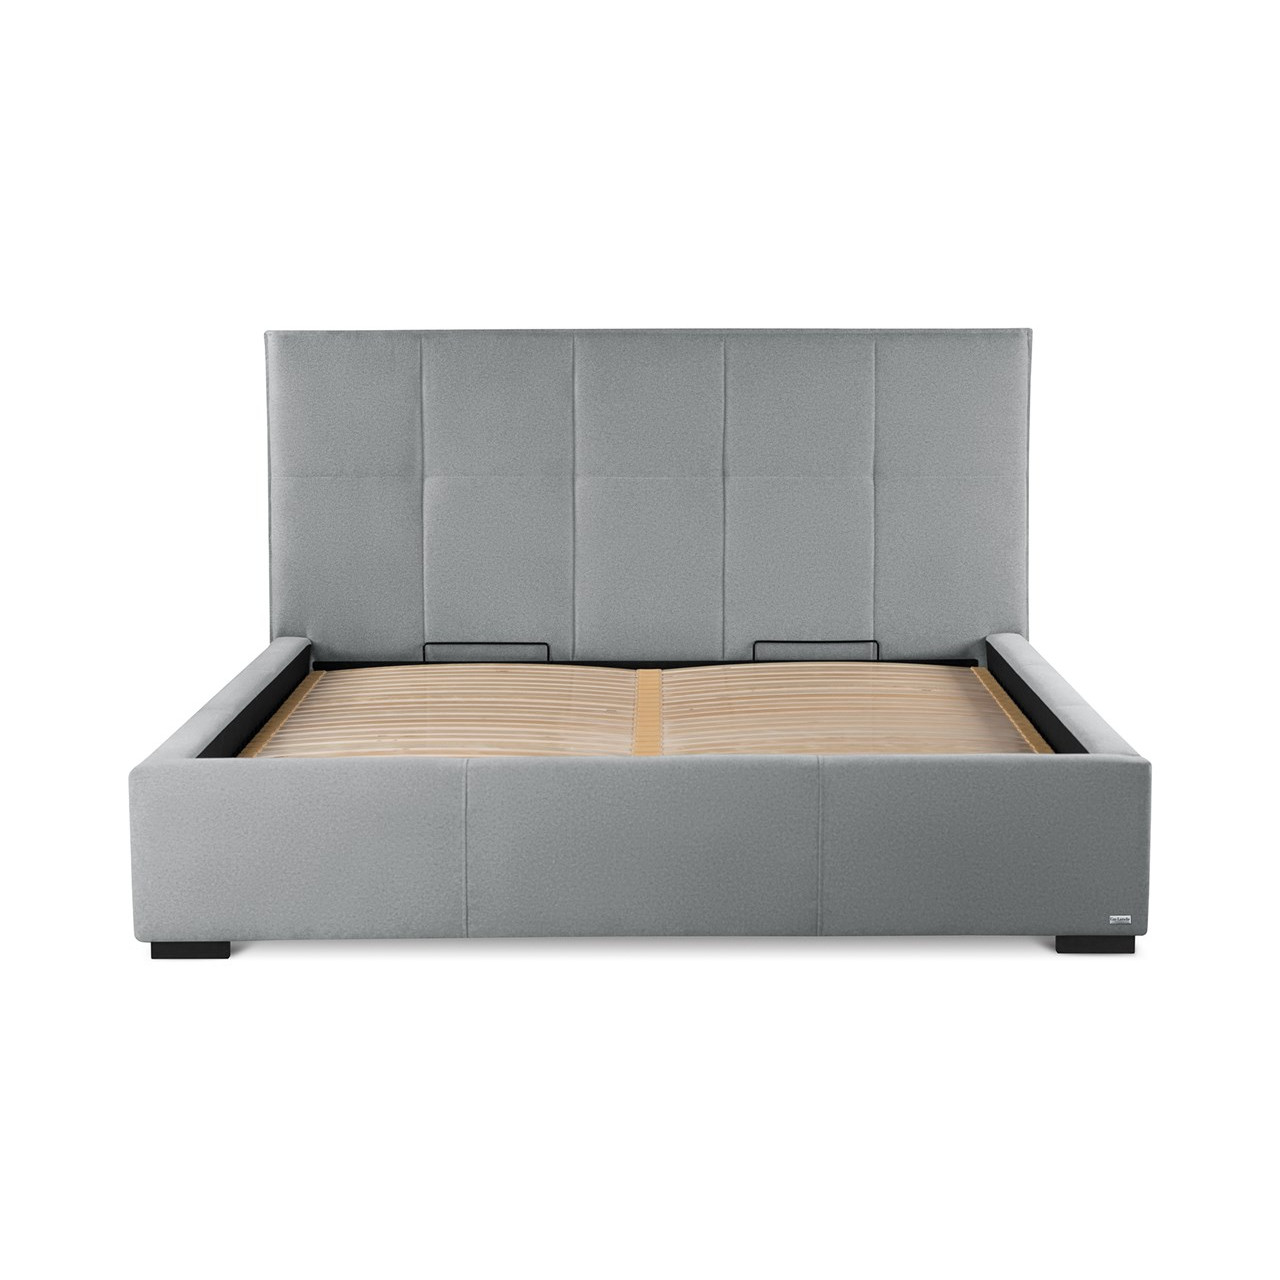 Lagerbett Allure | Grau